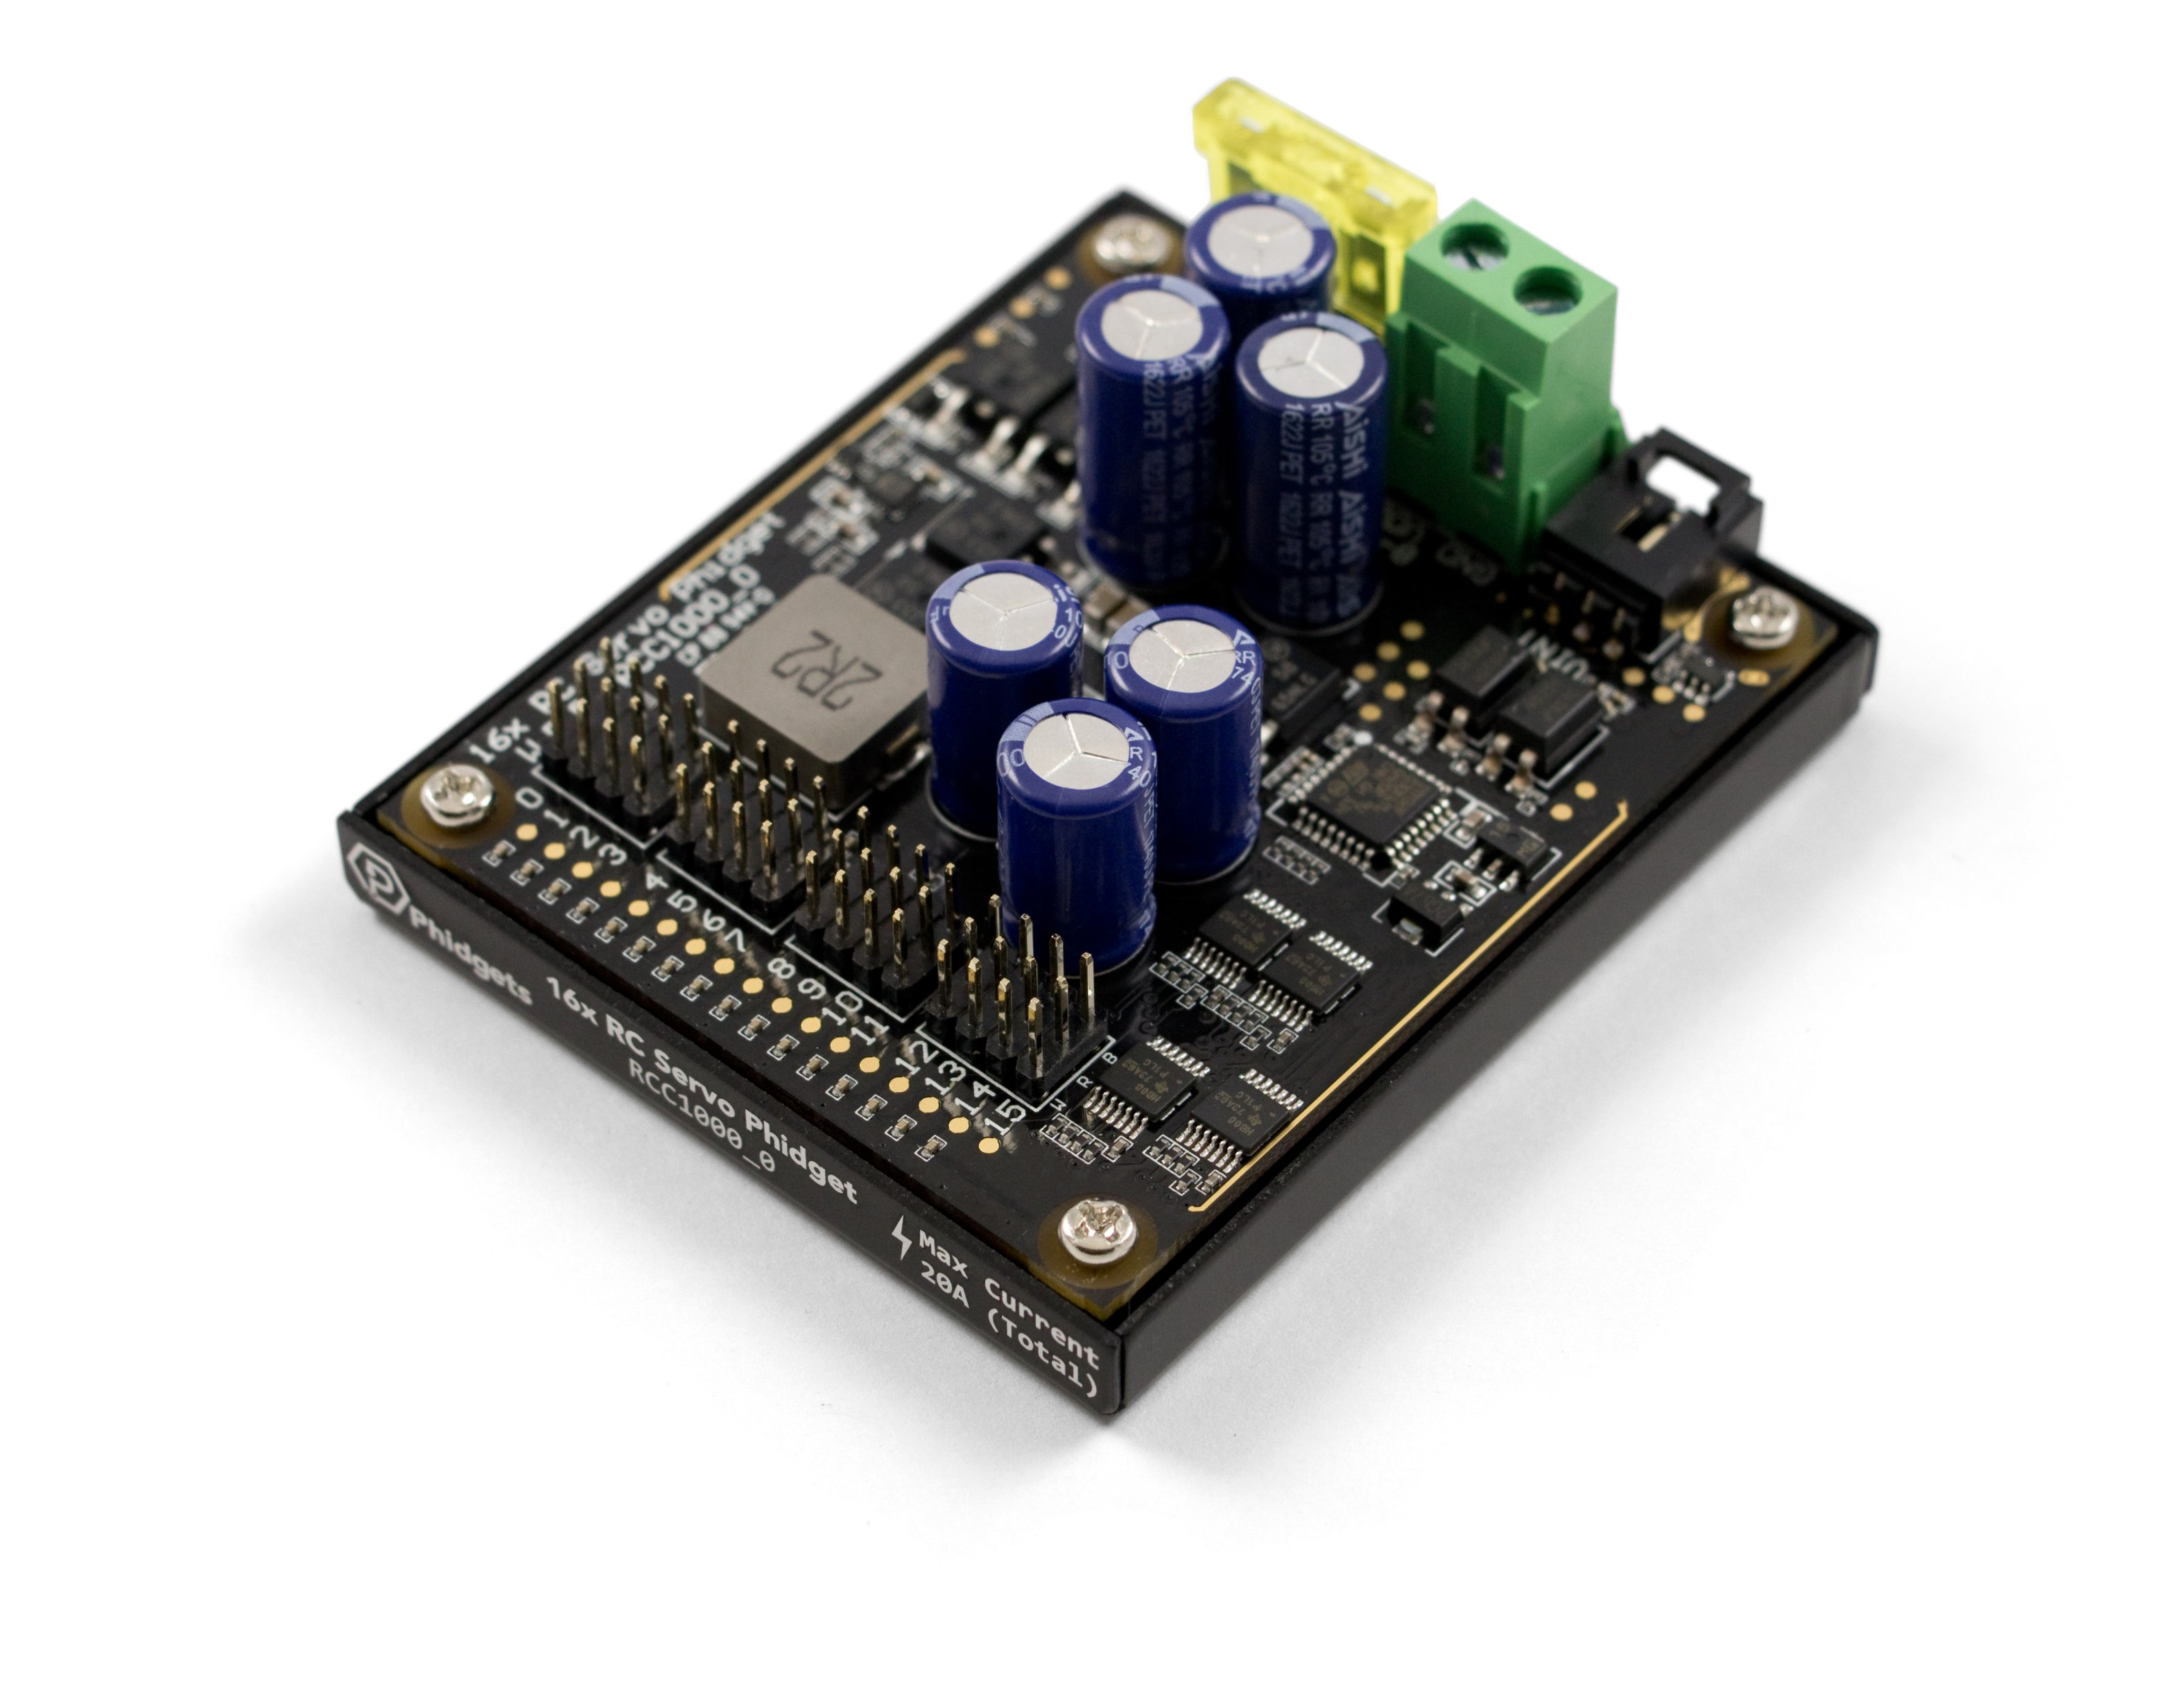 16x RC Servo Phidget - RCC1000_0 at Phidgets